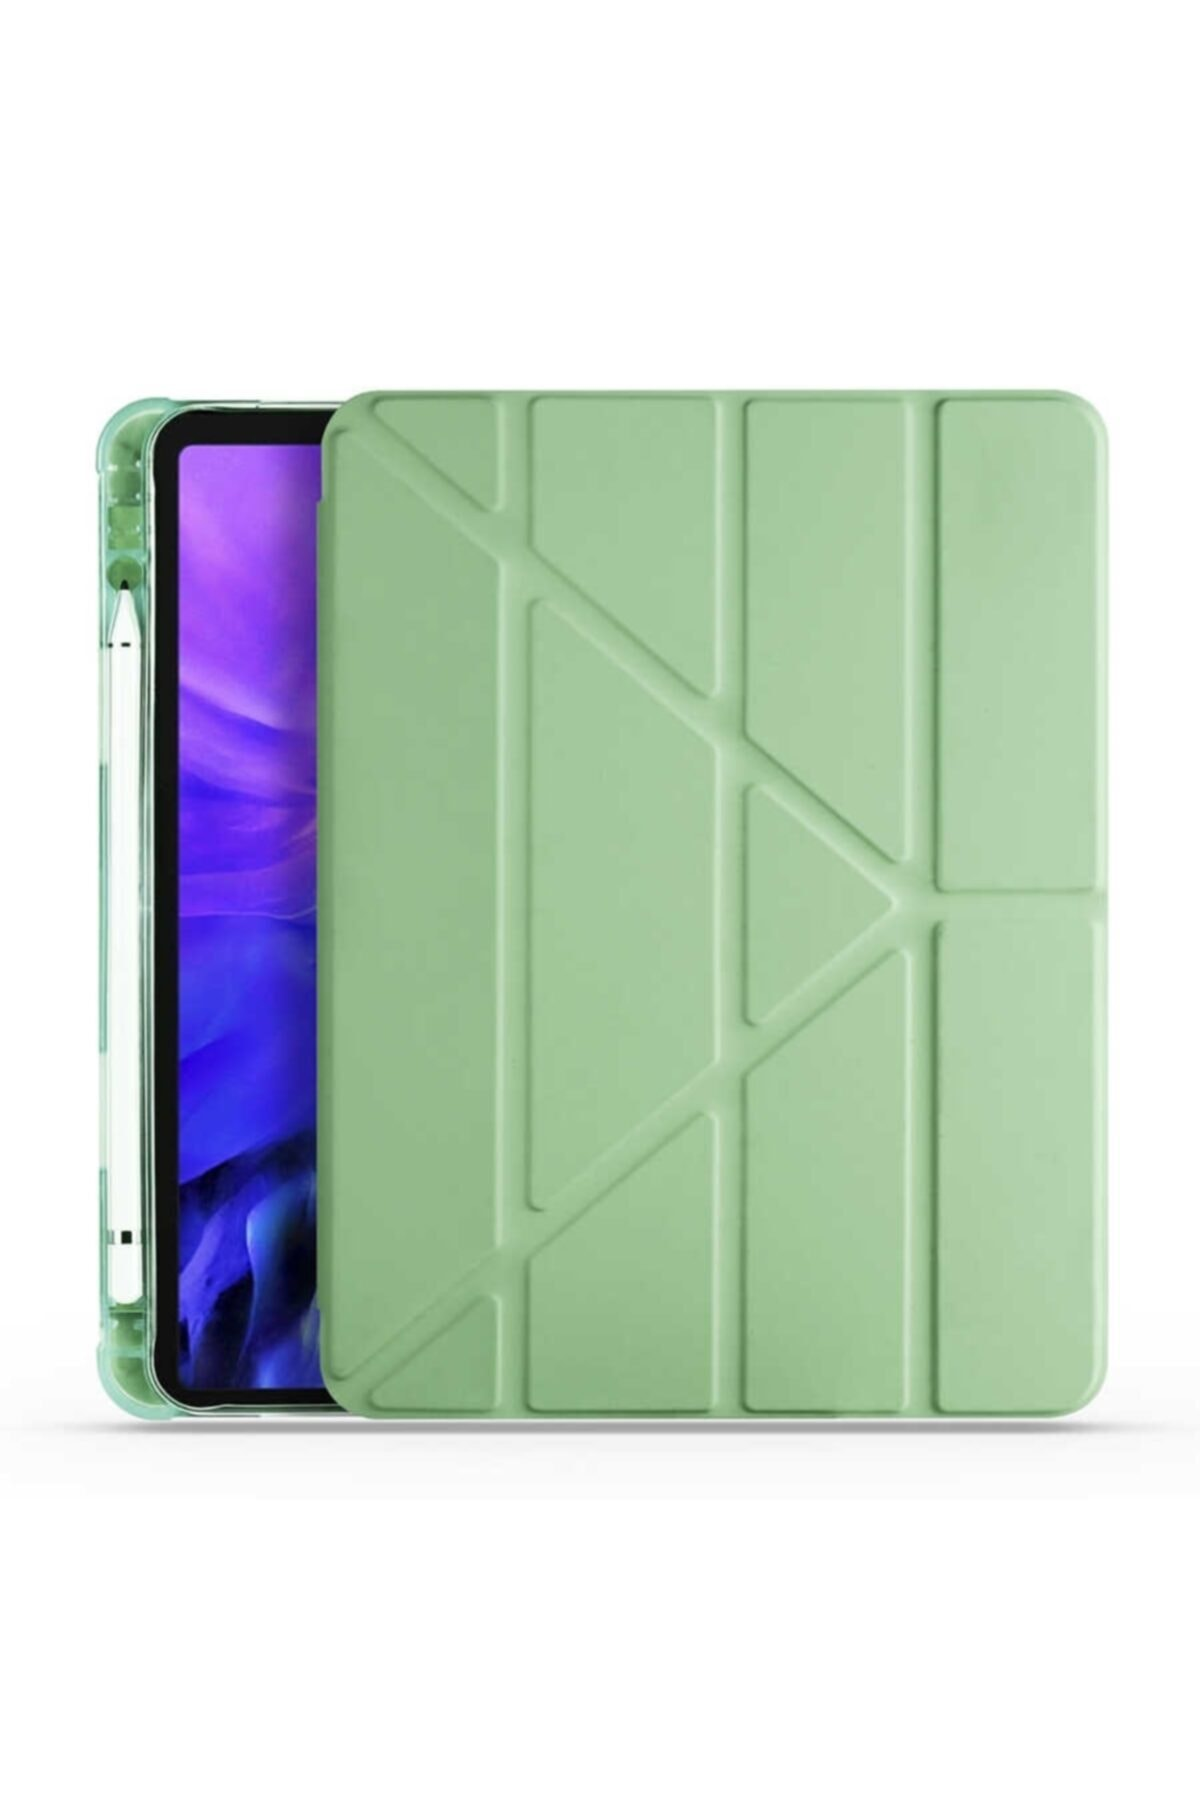 Galaxy Tab S6 Lite P610 Kılıf Tri Folding Smart Cover Standlı Kalemlikli Kapak Yeşil